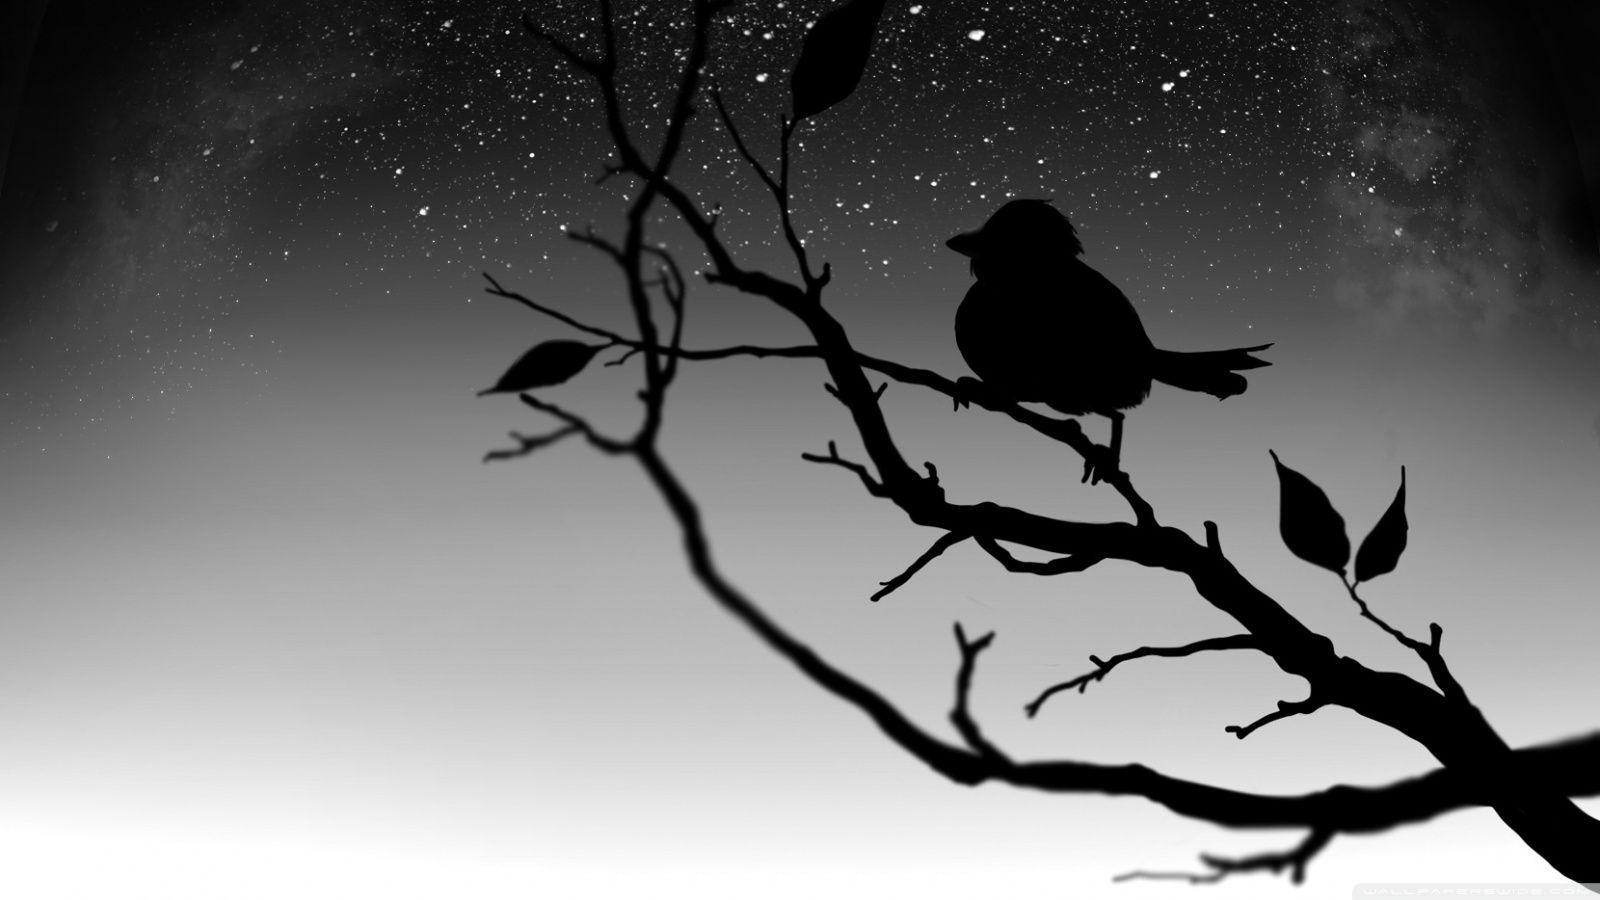 21529 Black Bird Wallpaper Hd